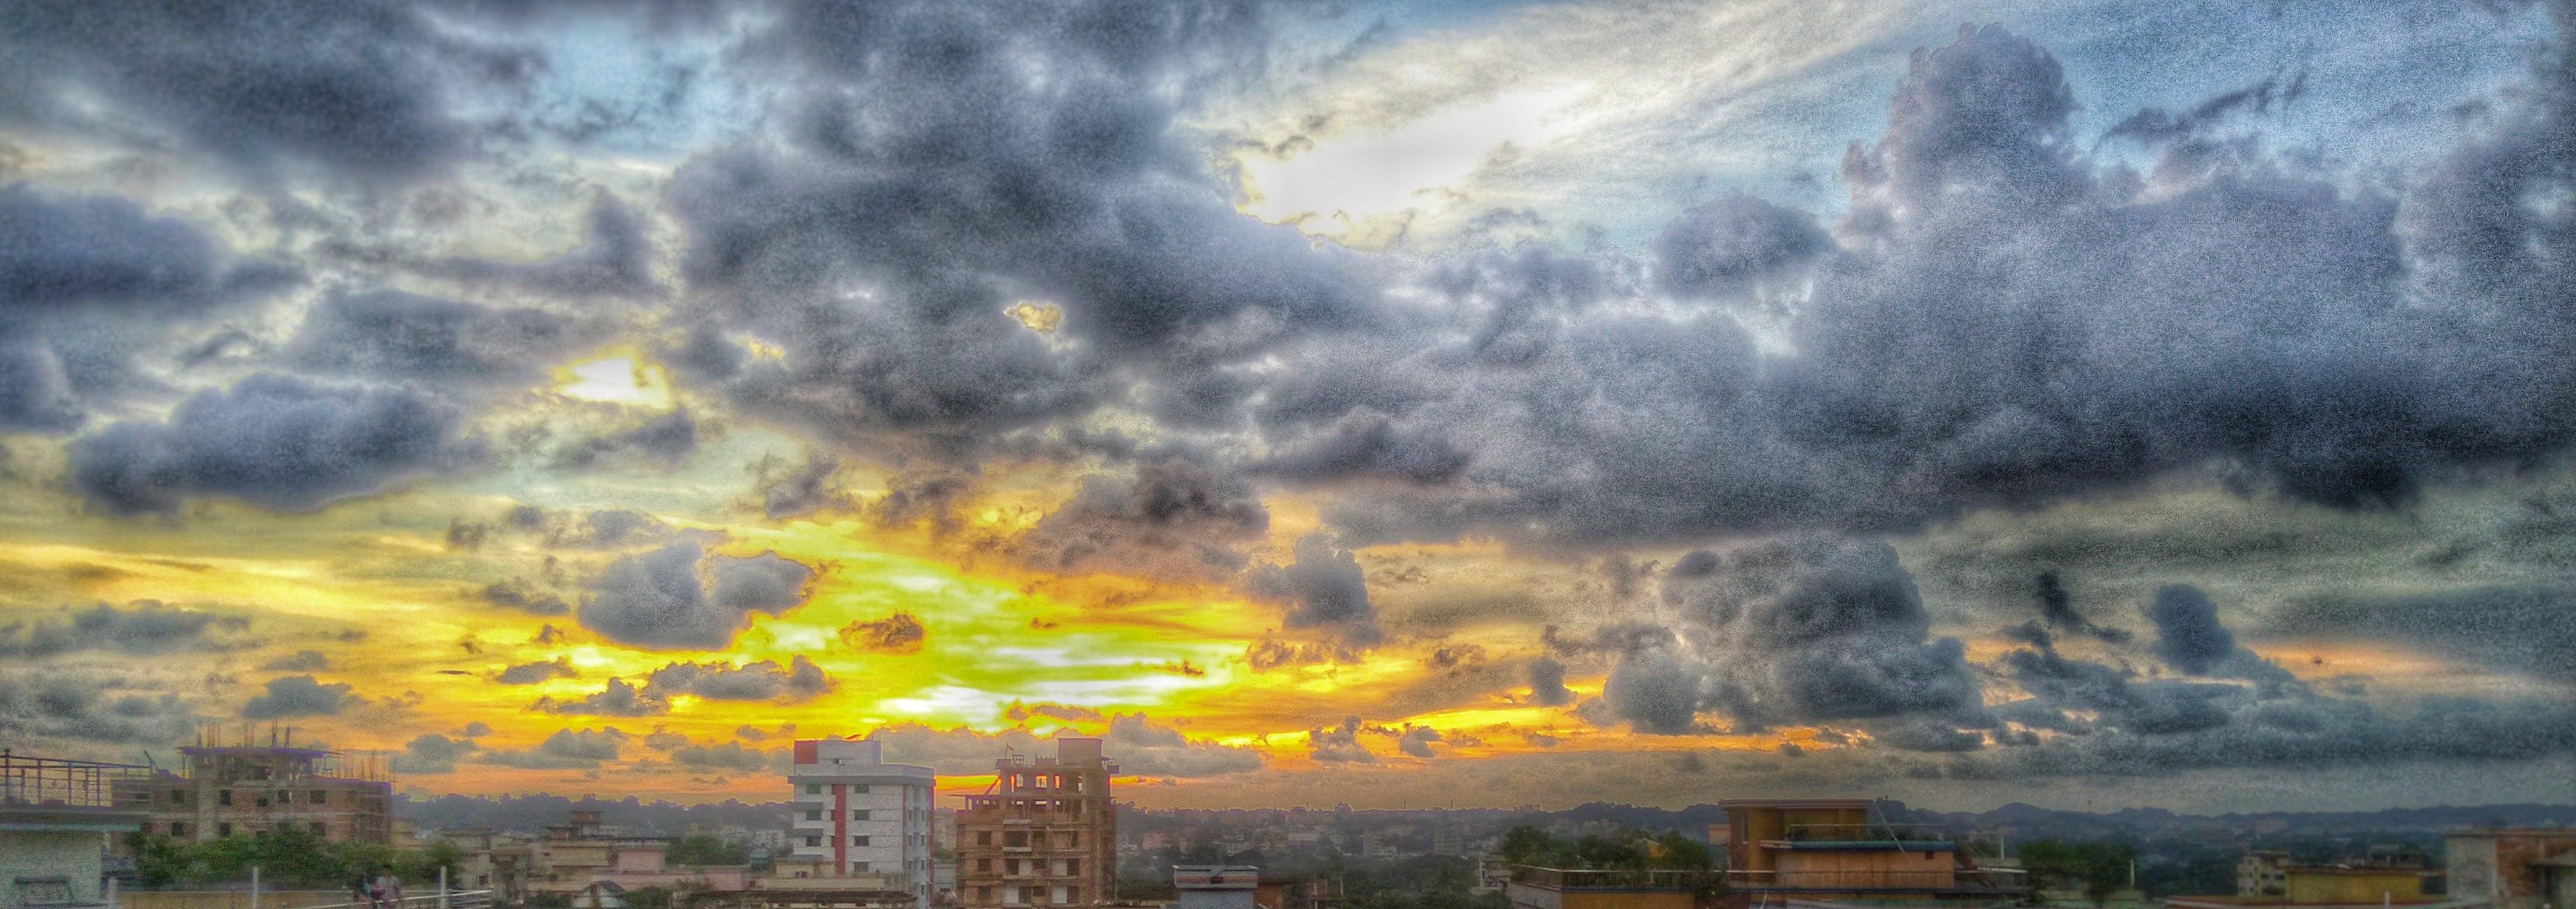 Free stock photo of bangladesh, blue sky, clouds, cloudy sky